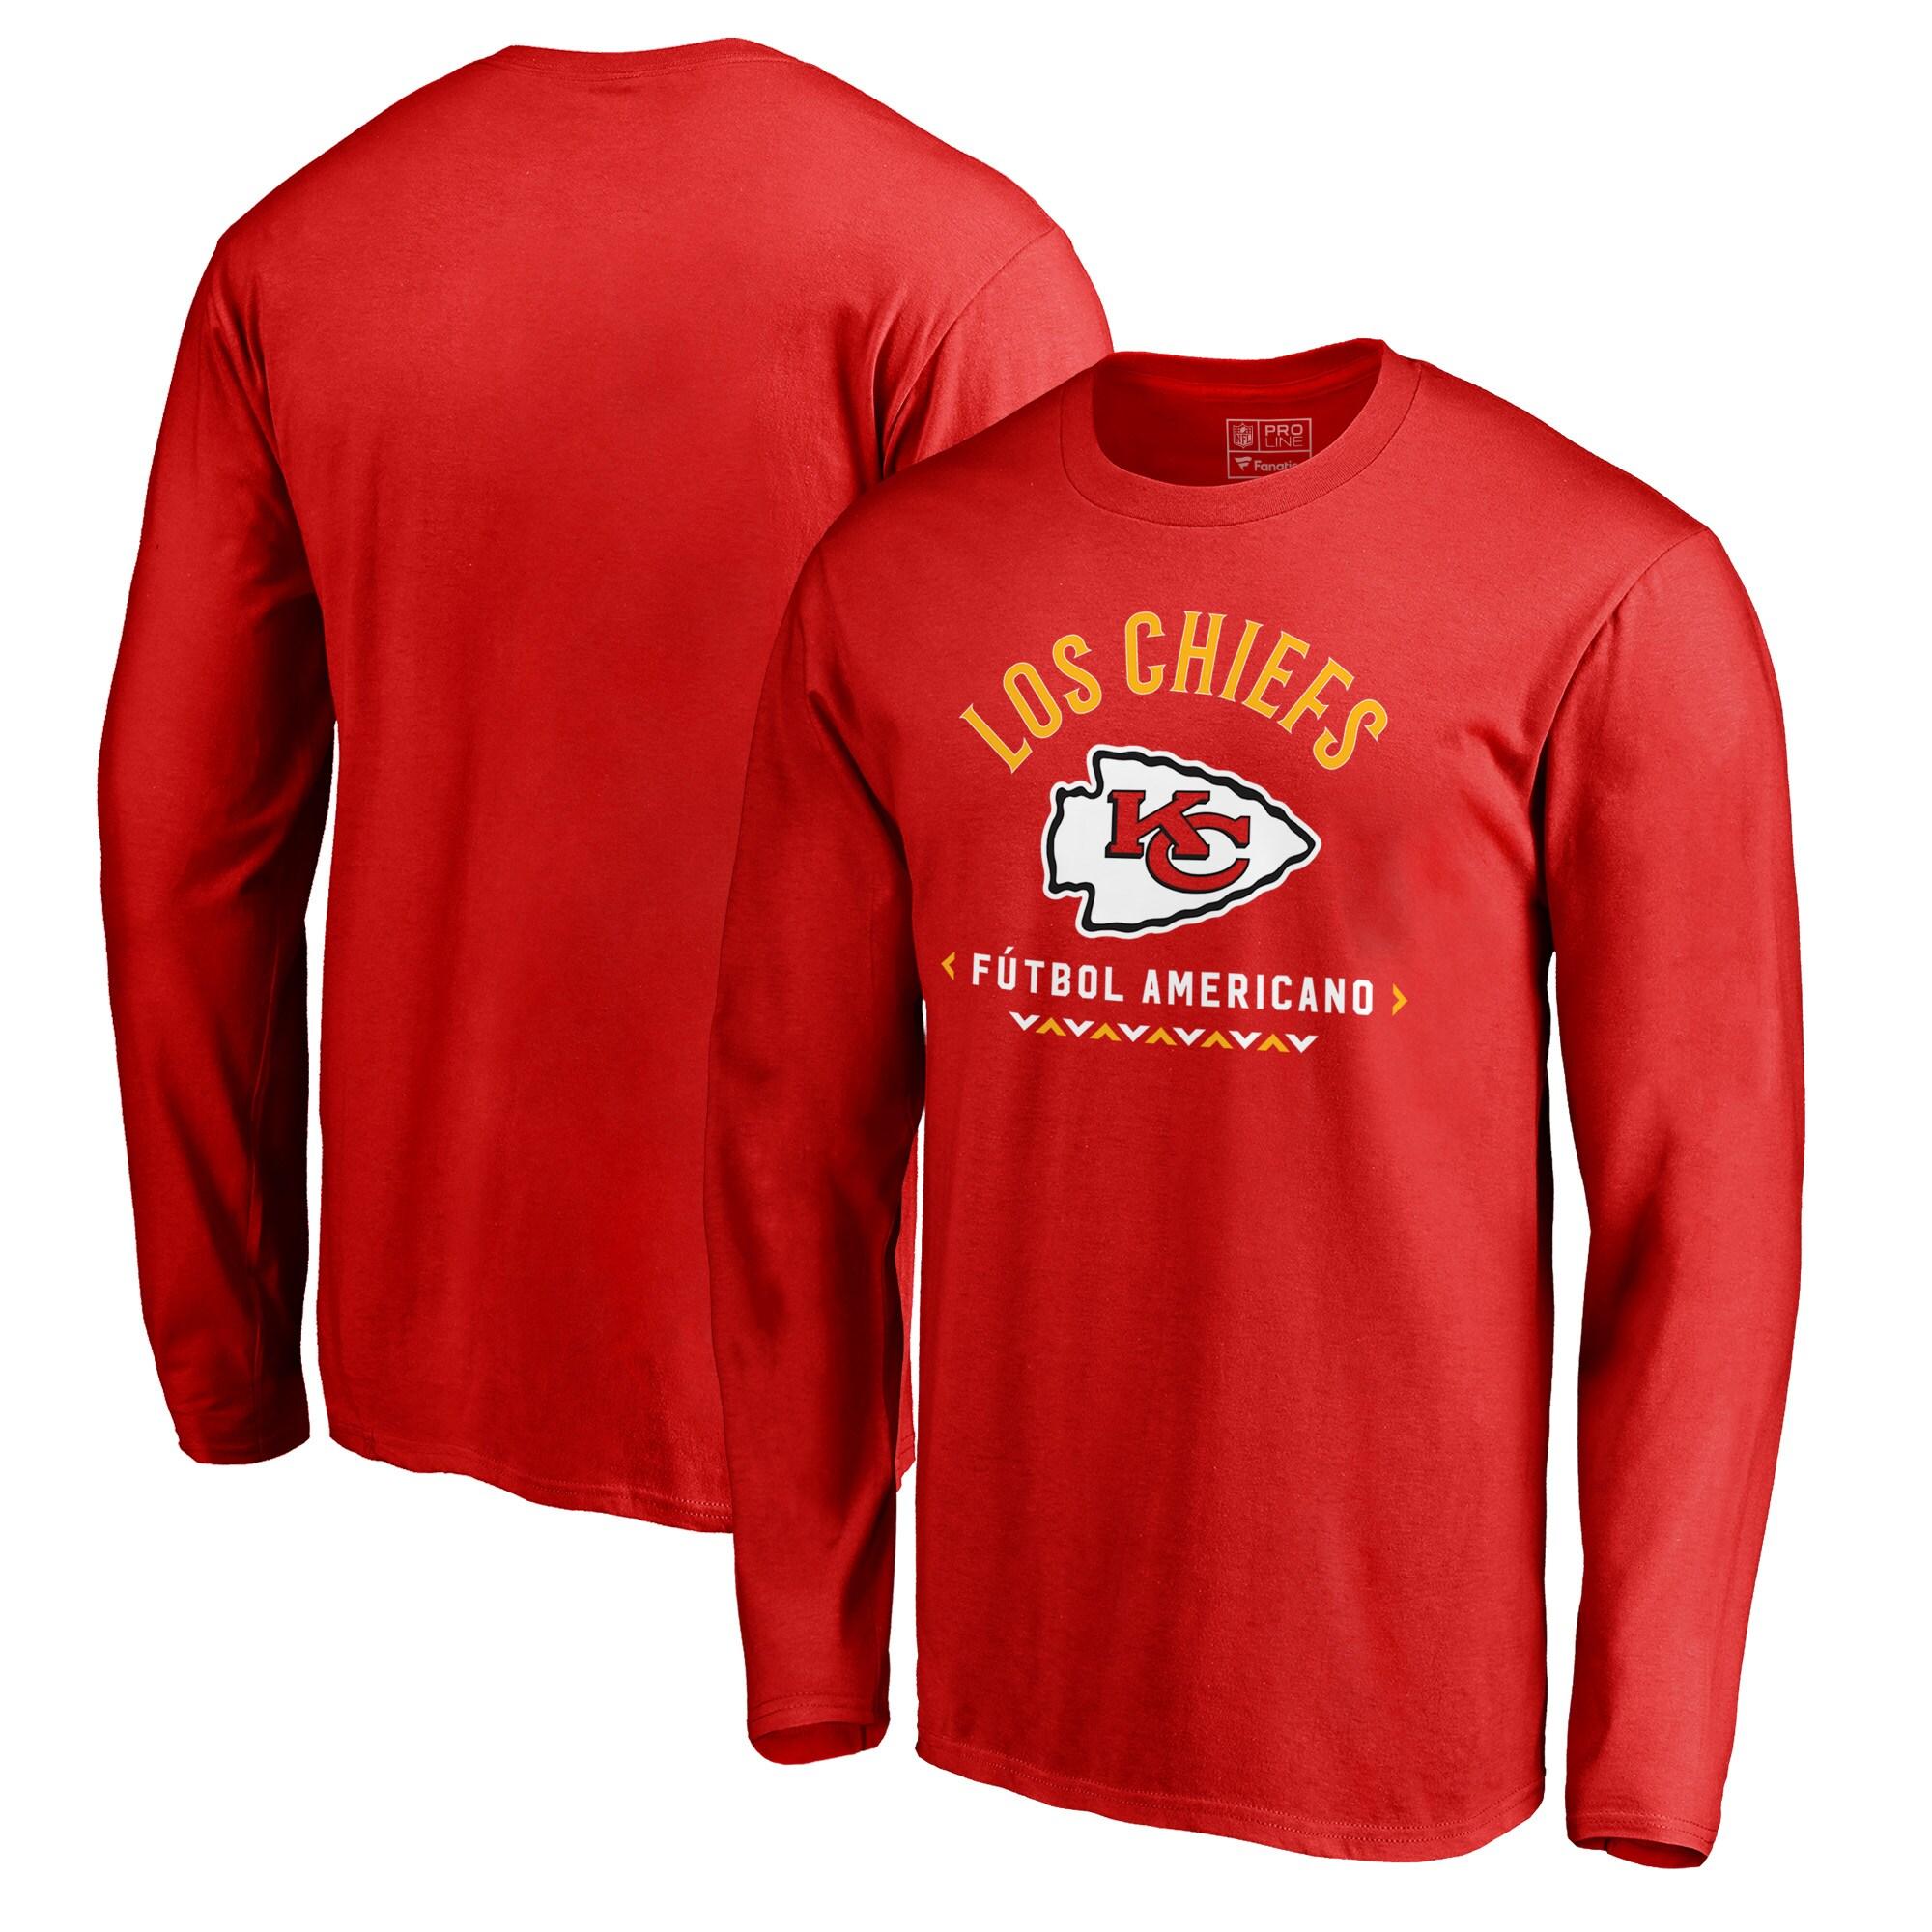 Kansas City Chiefs NFL Pro Line by Fanatics Branded Futbol Americano Long Sleeve T-Shirt - Red